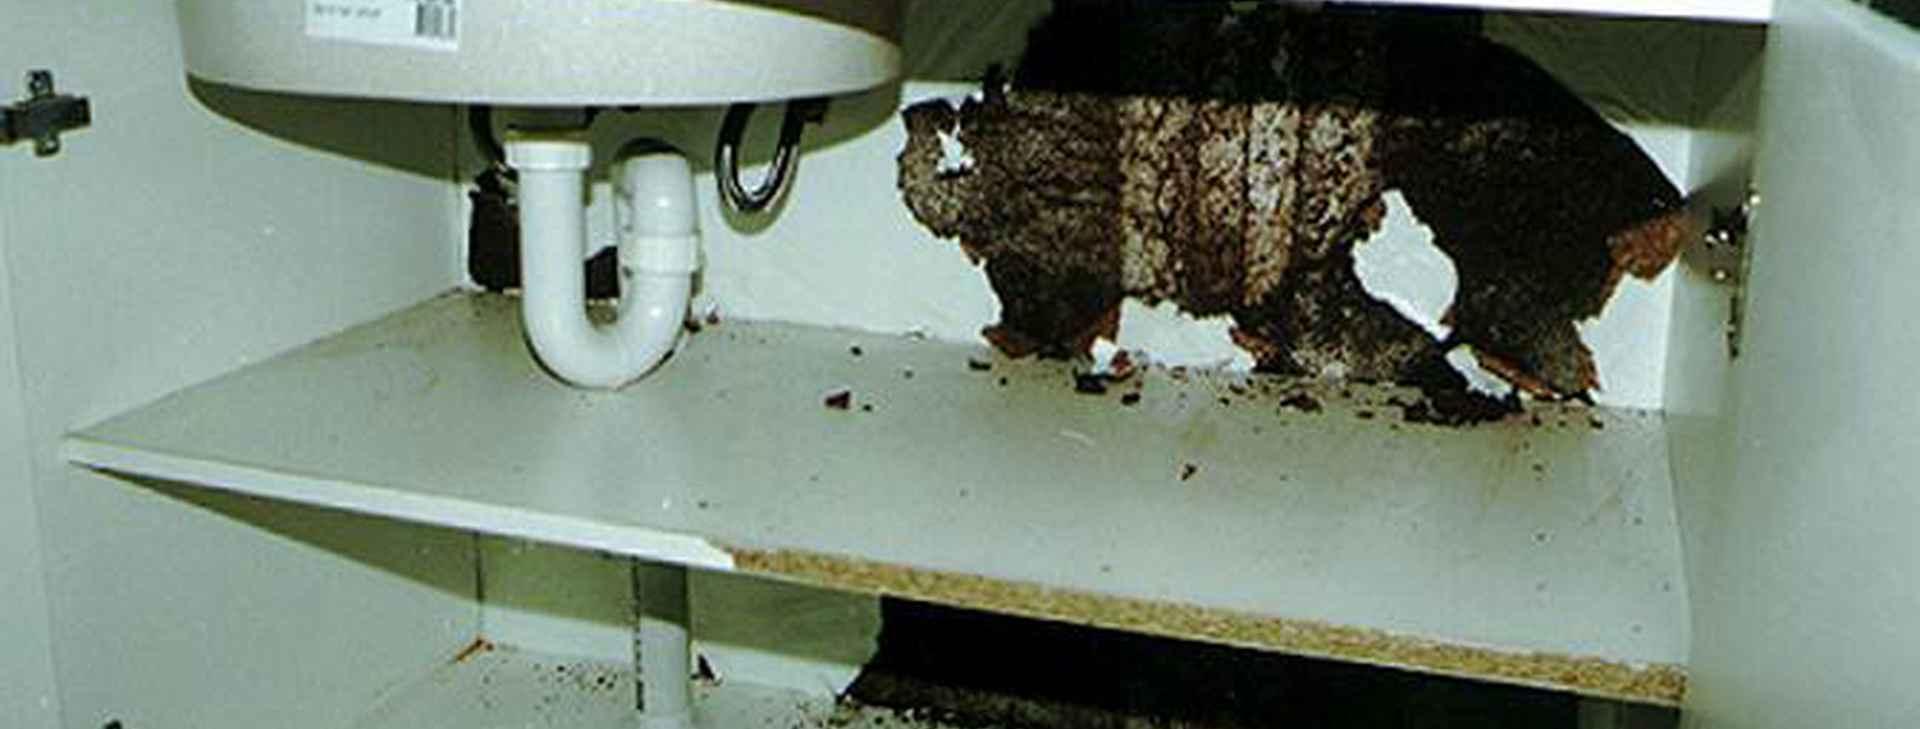 Termite Damage Termimesh